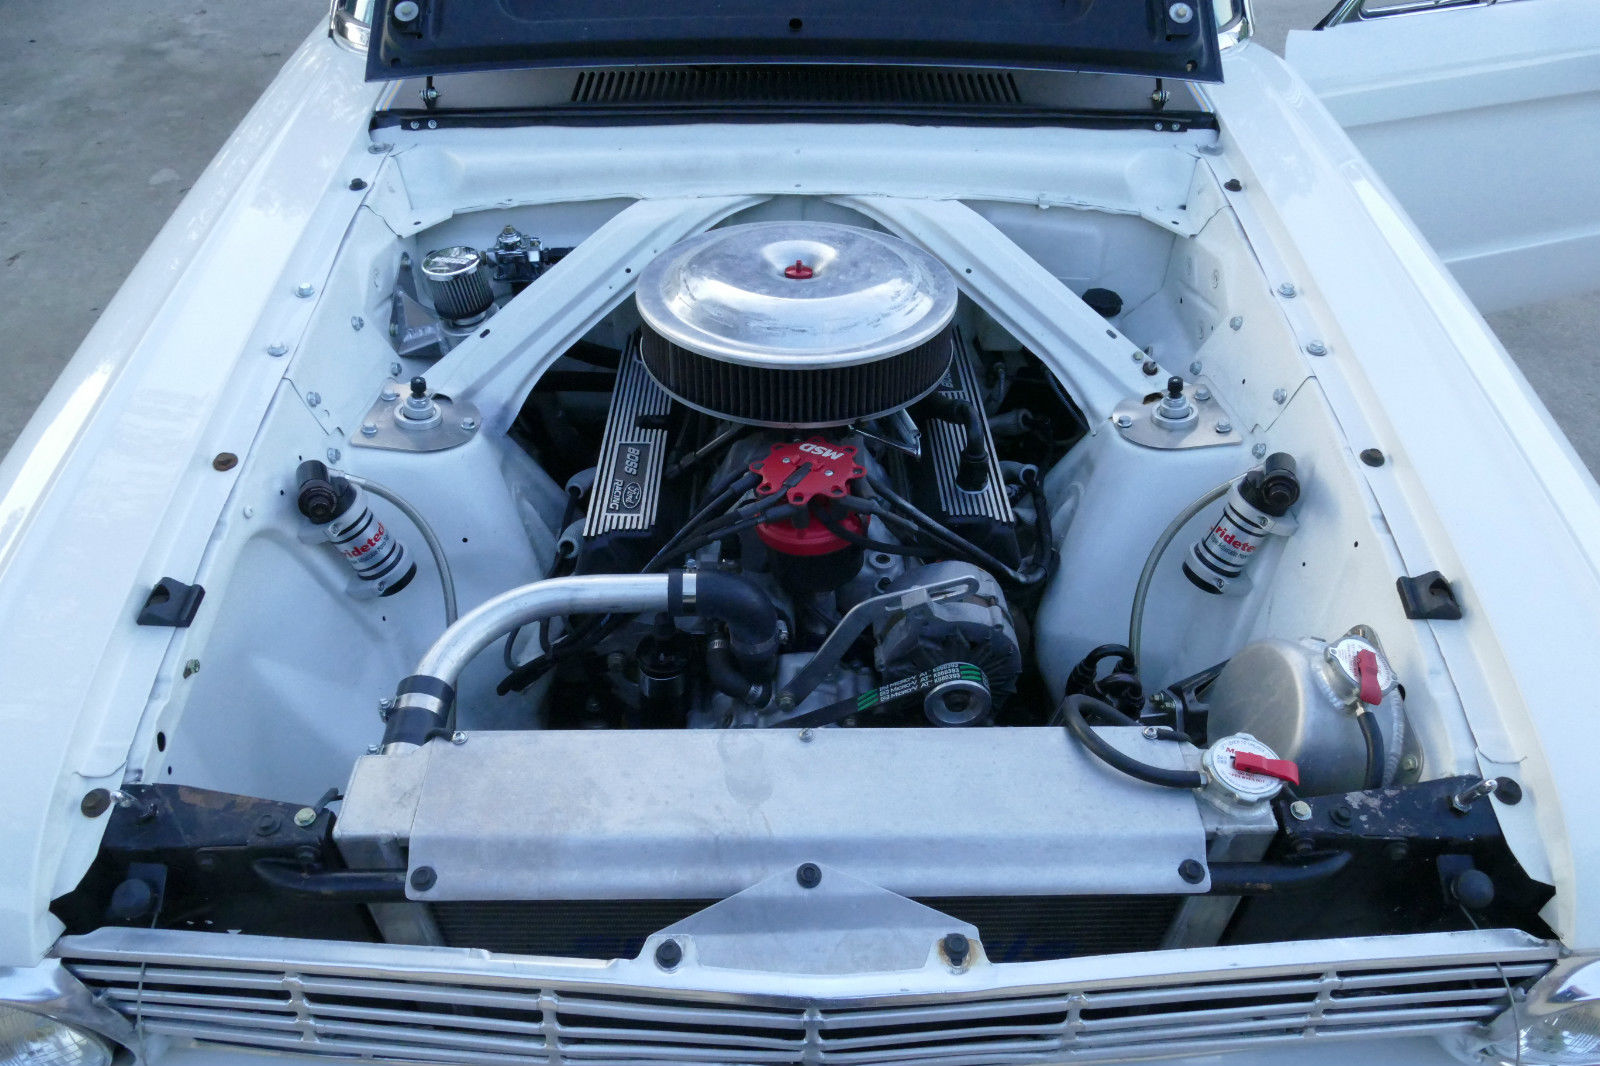 For Sale: Aaron Kaufman's 1963 Falcon Race Car – Engine Swap Depot